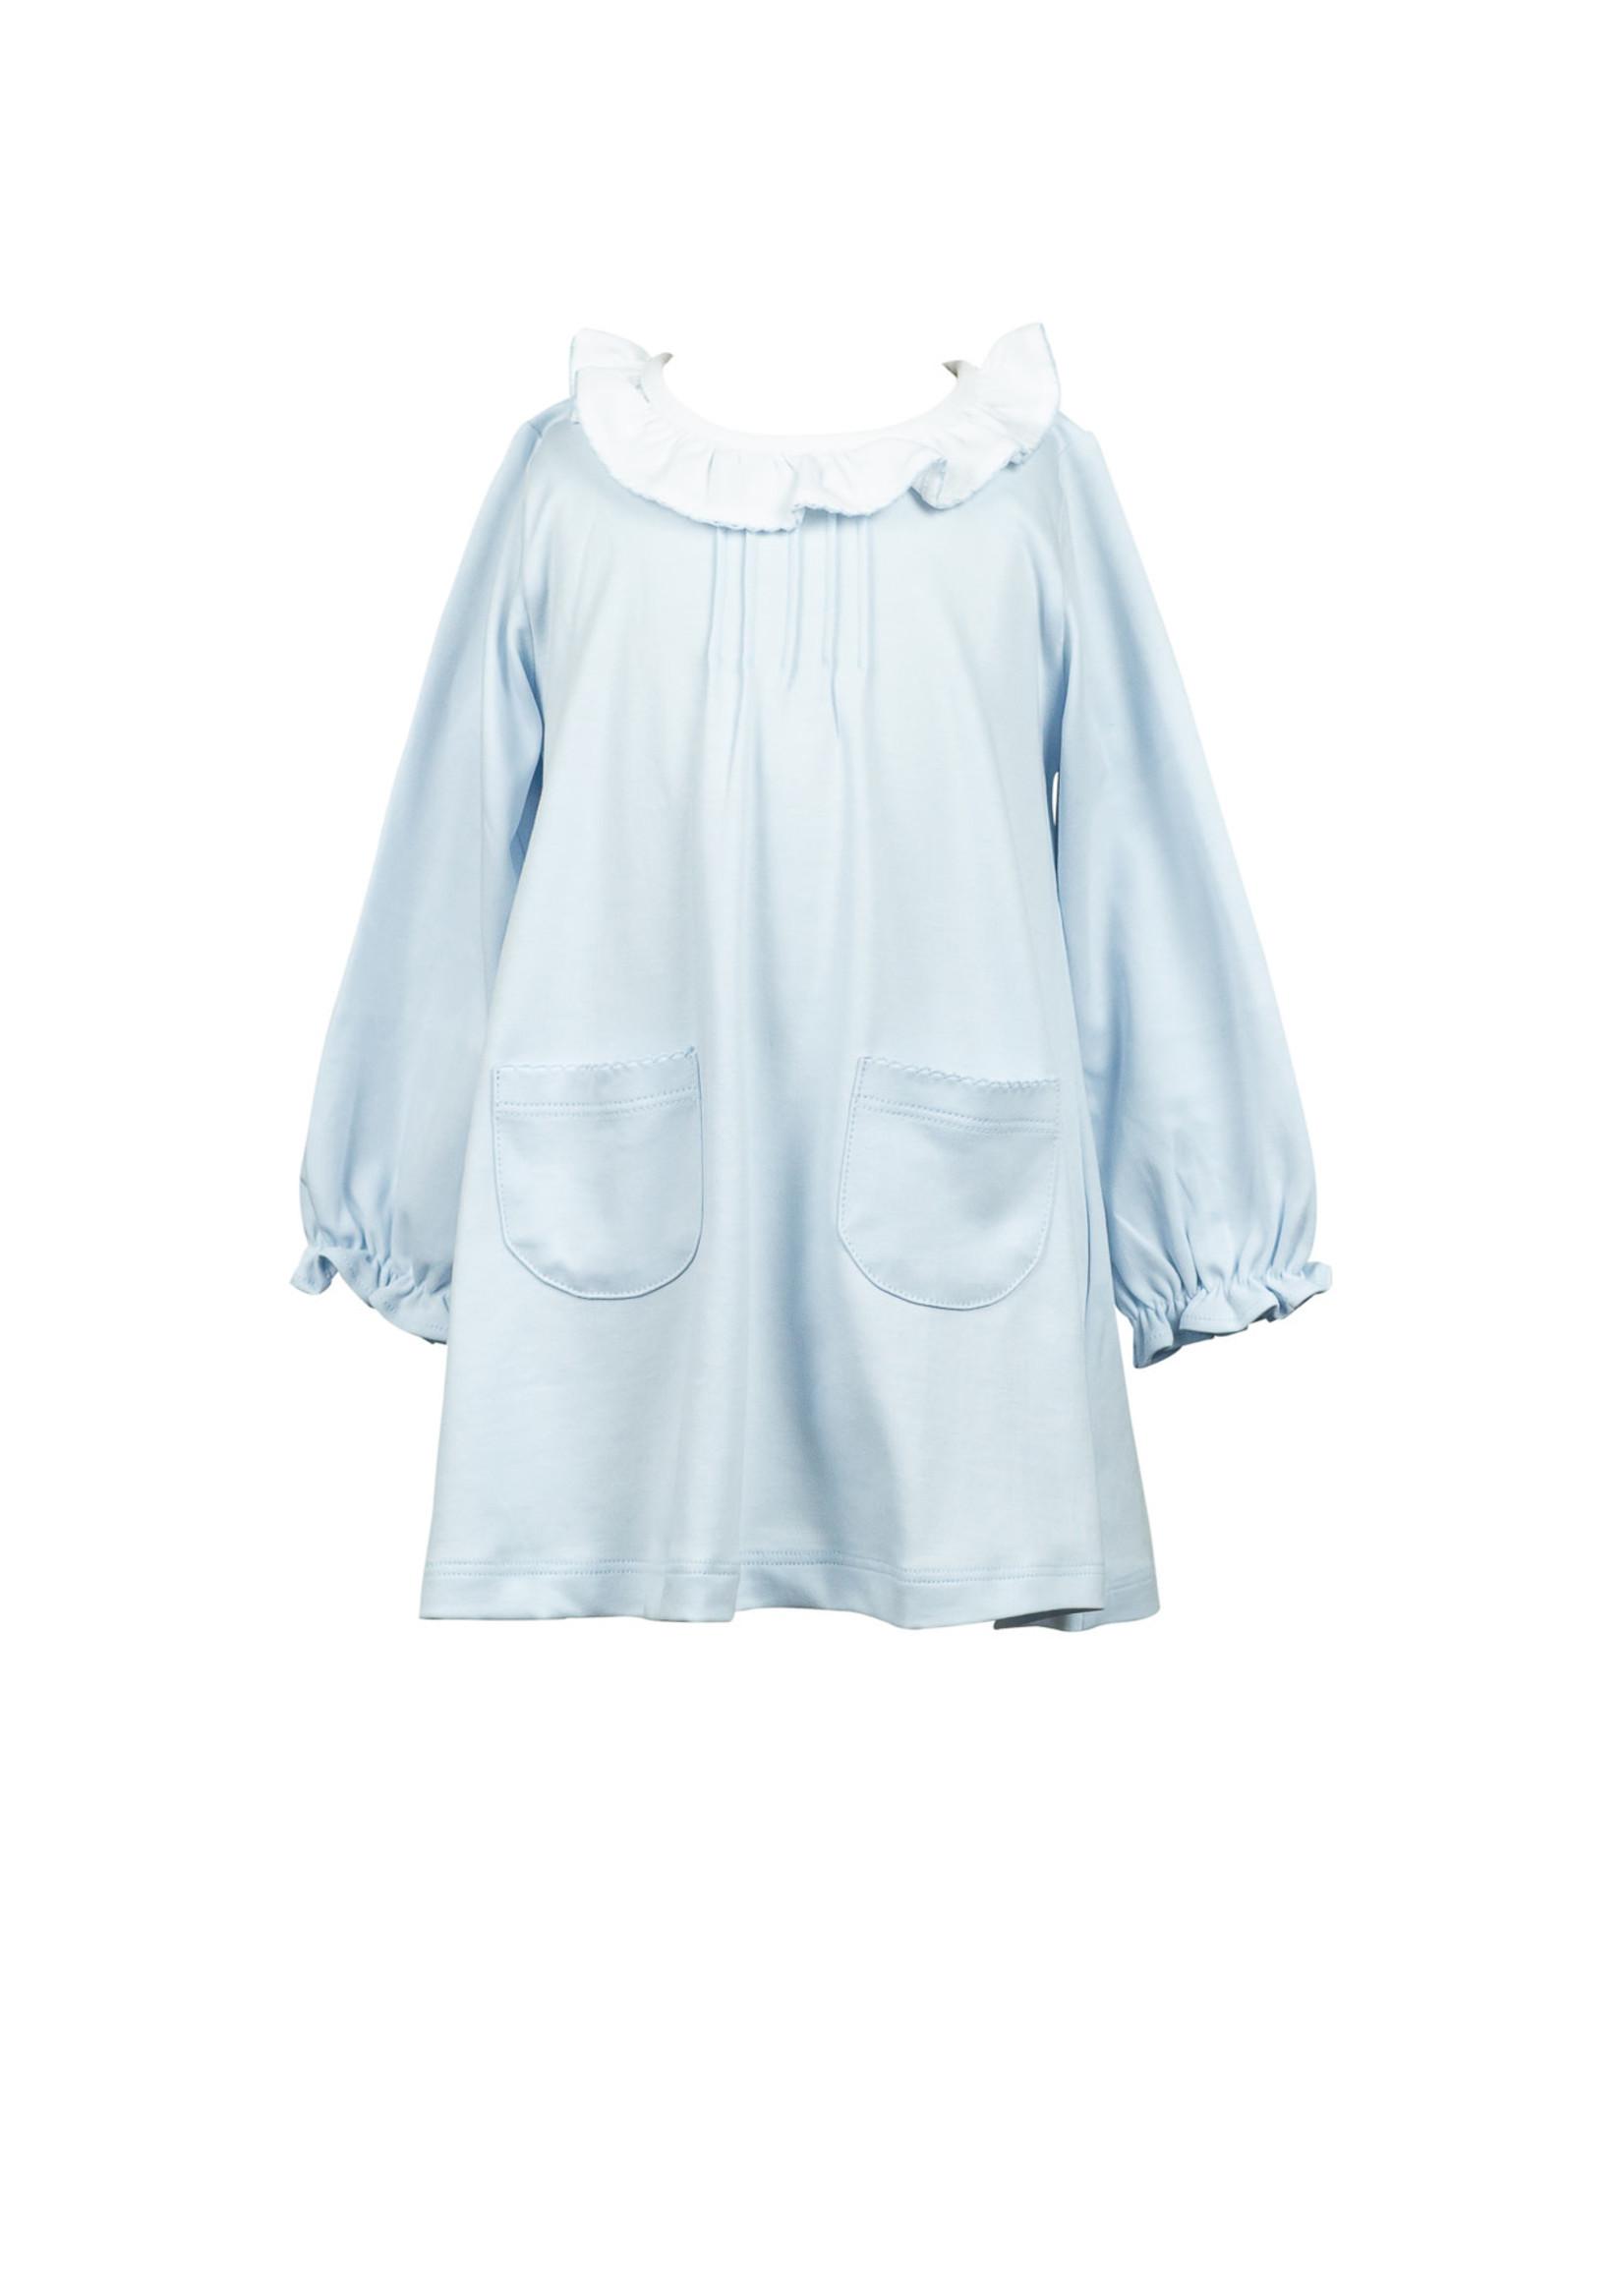 Proper Peony Solid Blue Aline Dress